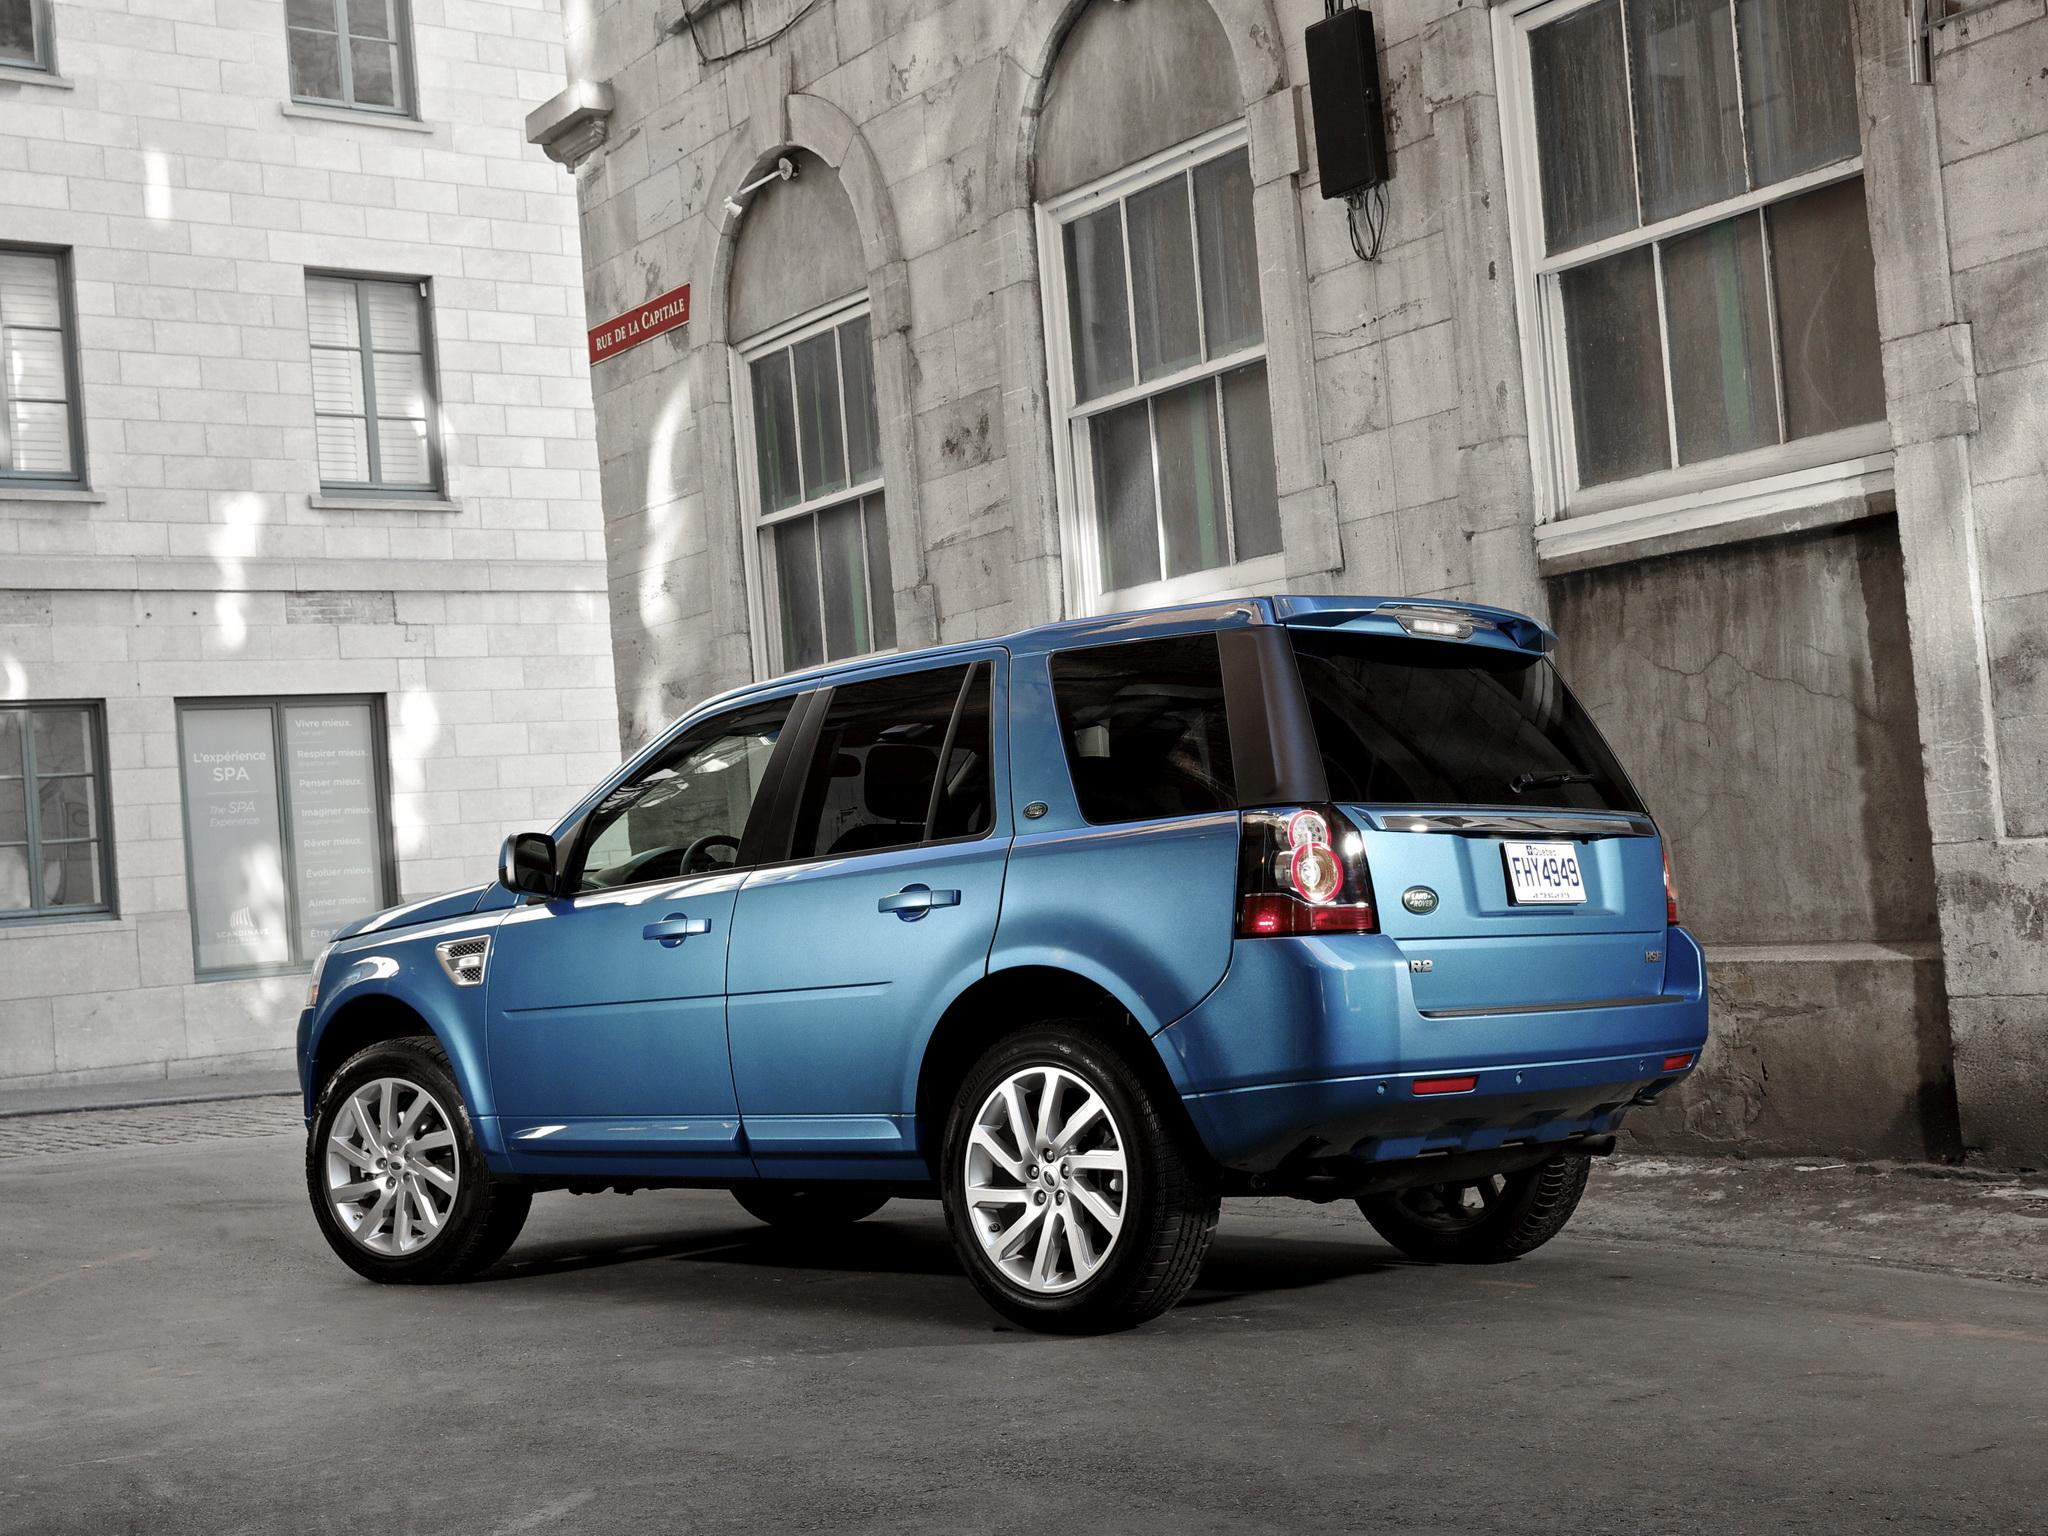 Land Rover Freelander I — описание модели